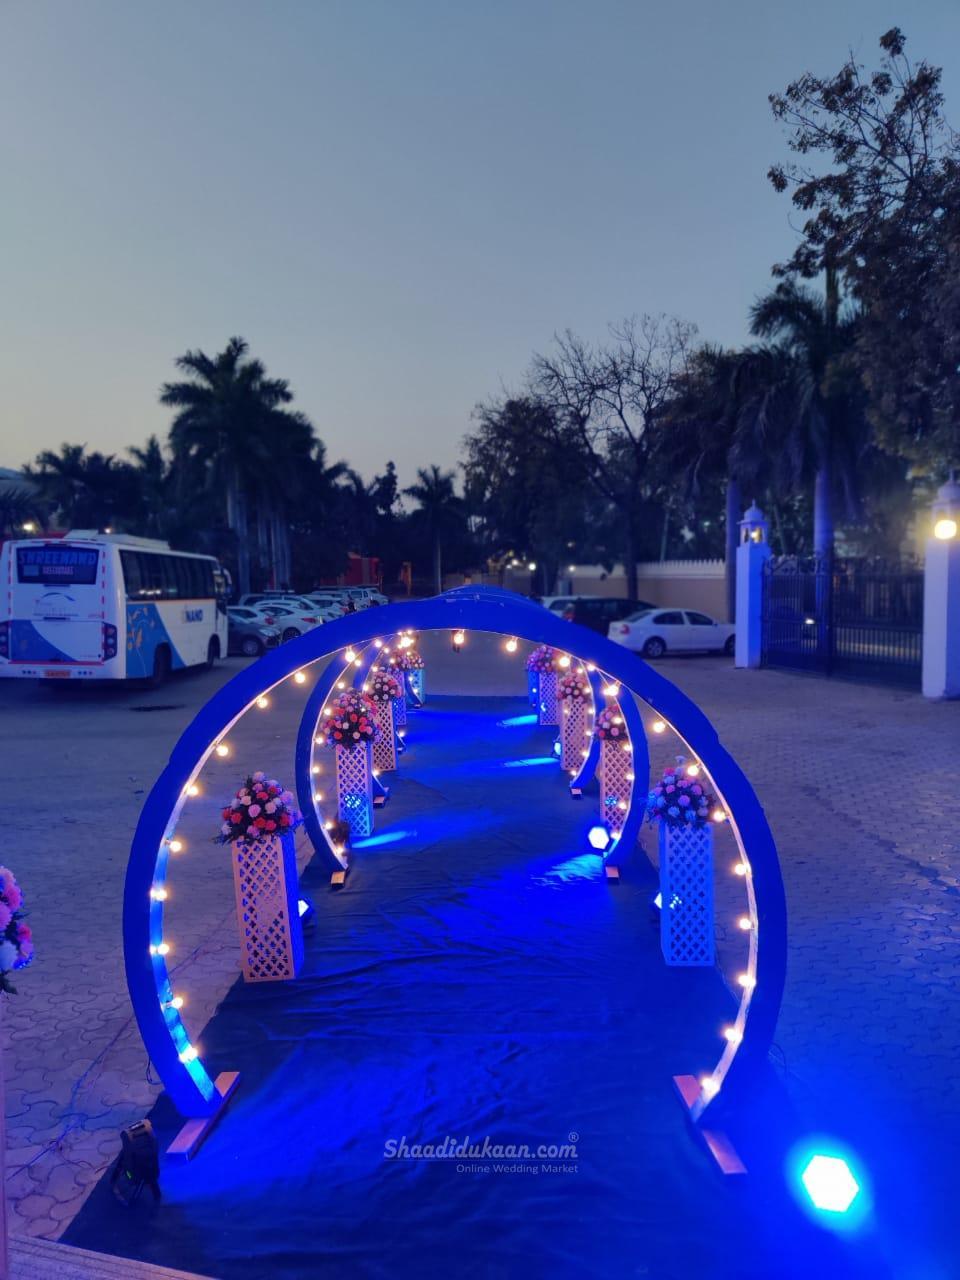 Vikram Tent House & The Wedding Design